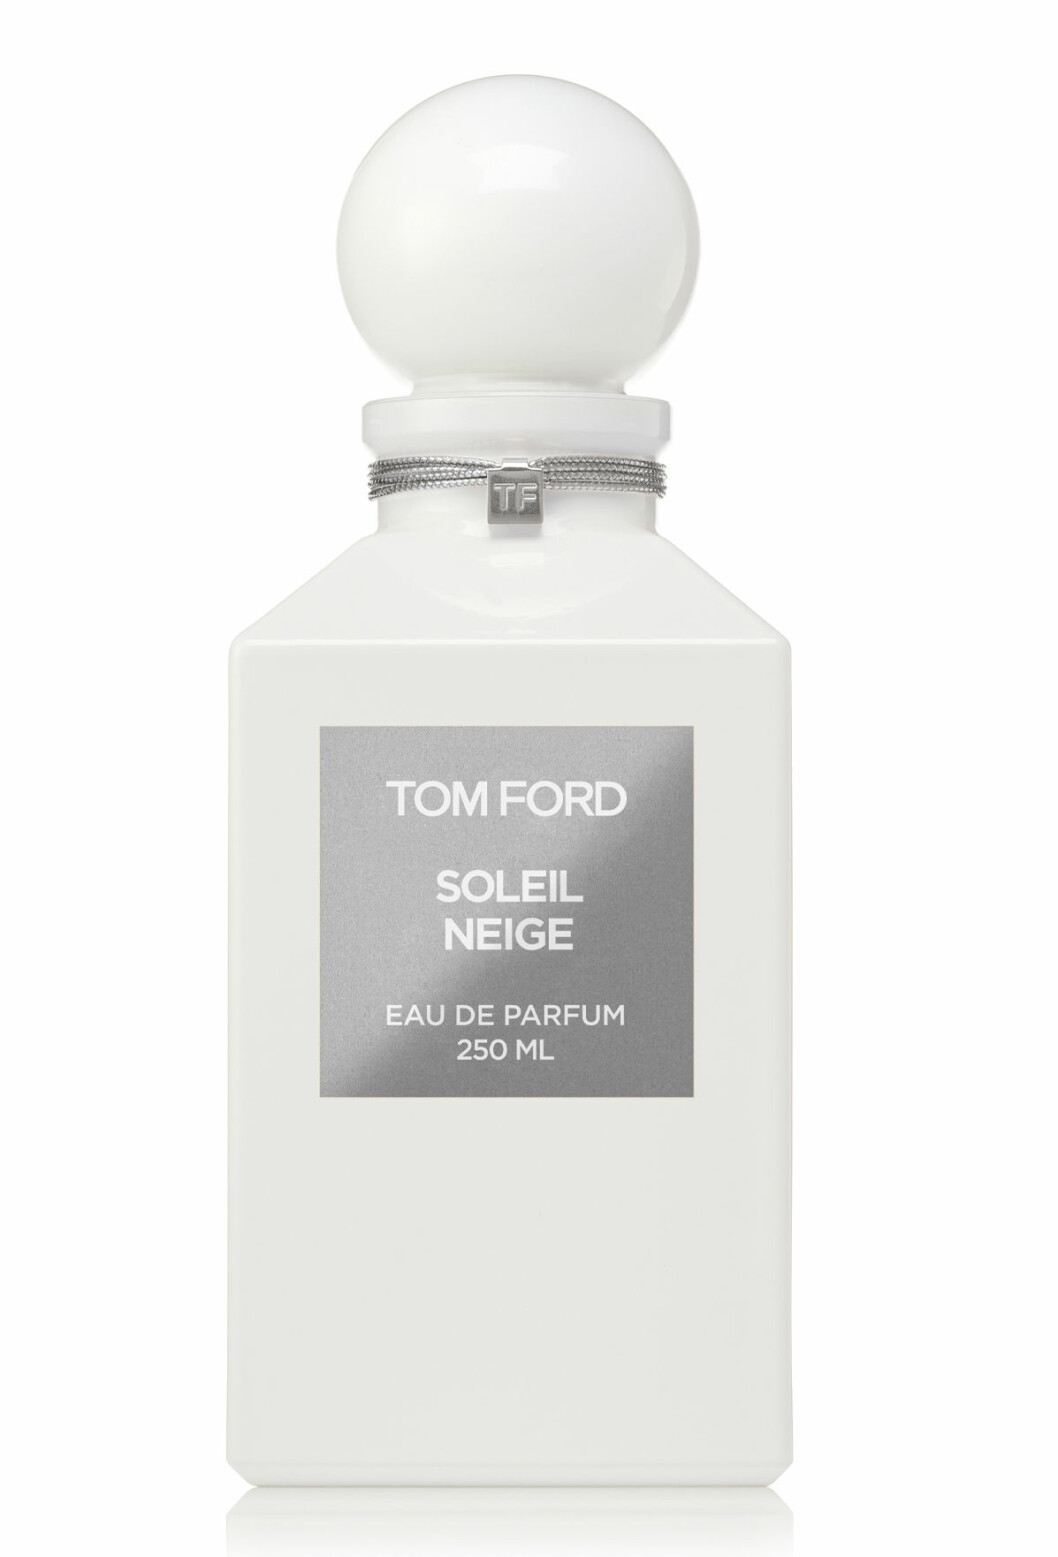 Tom Fords parfym Soleil Neige.